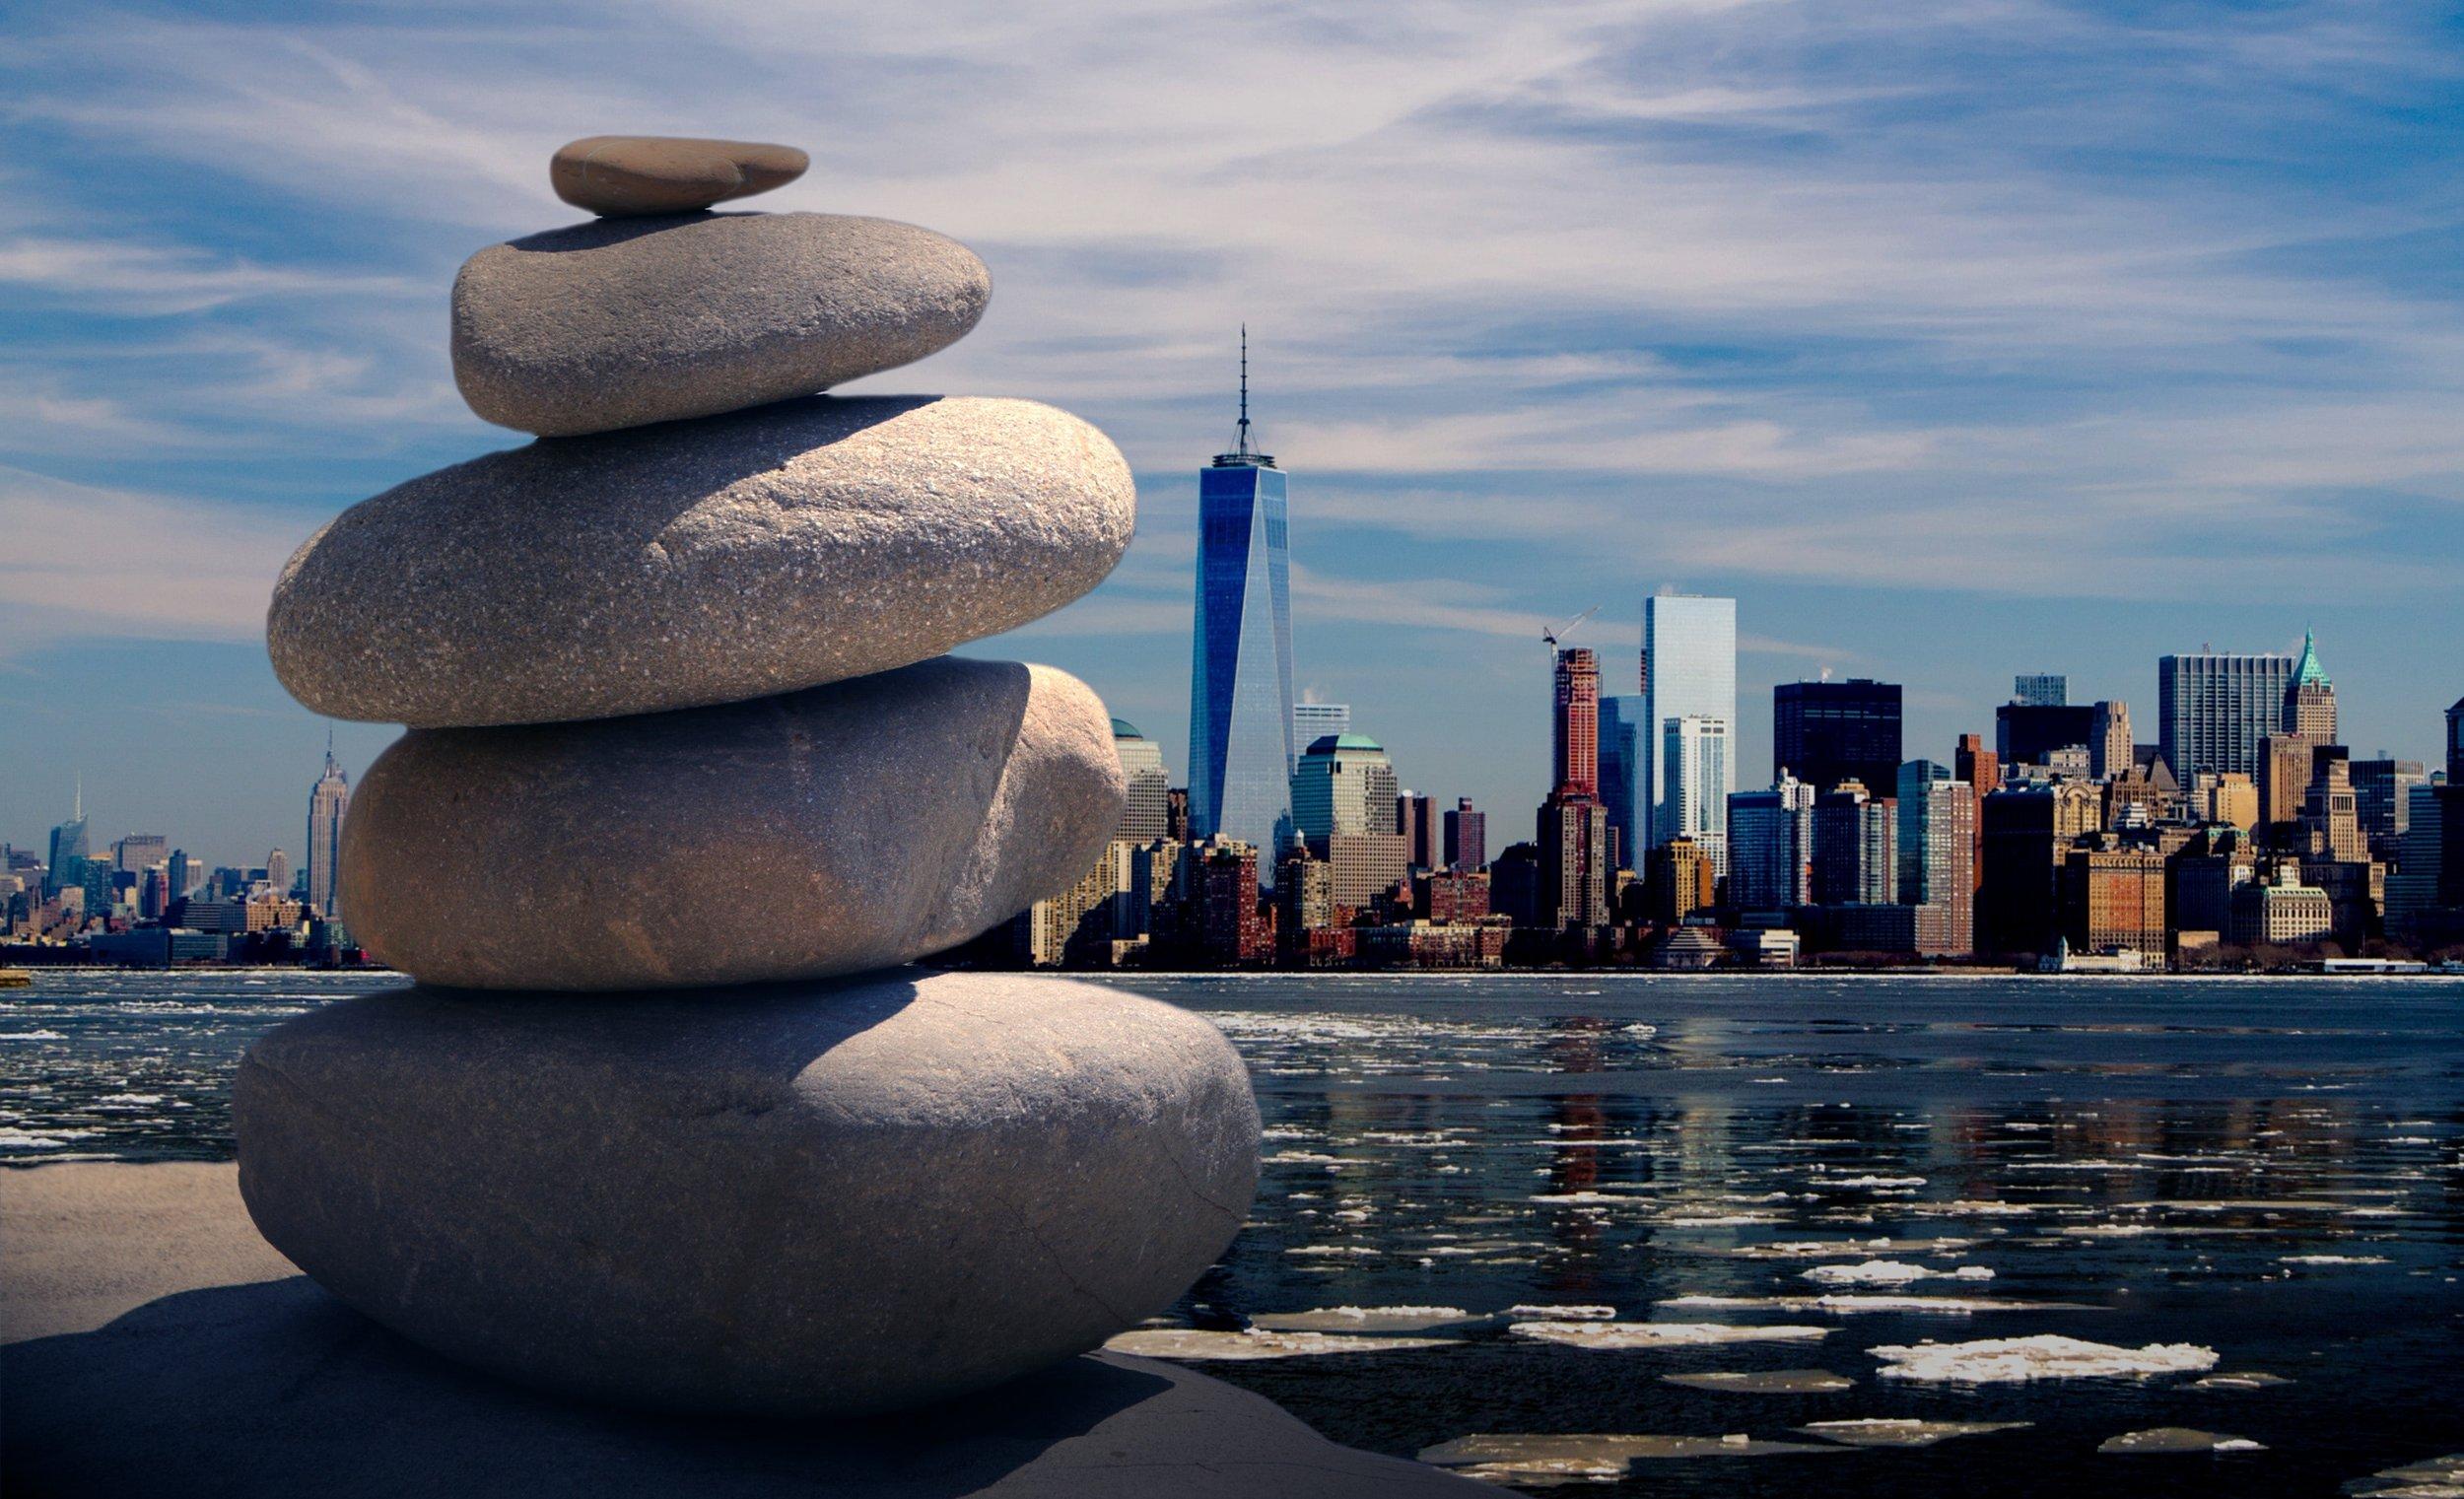 city-cityscape-meditation-289588.jpg